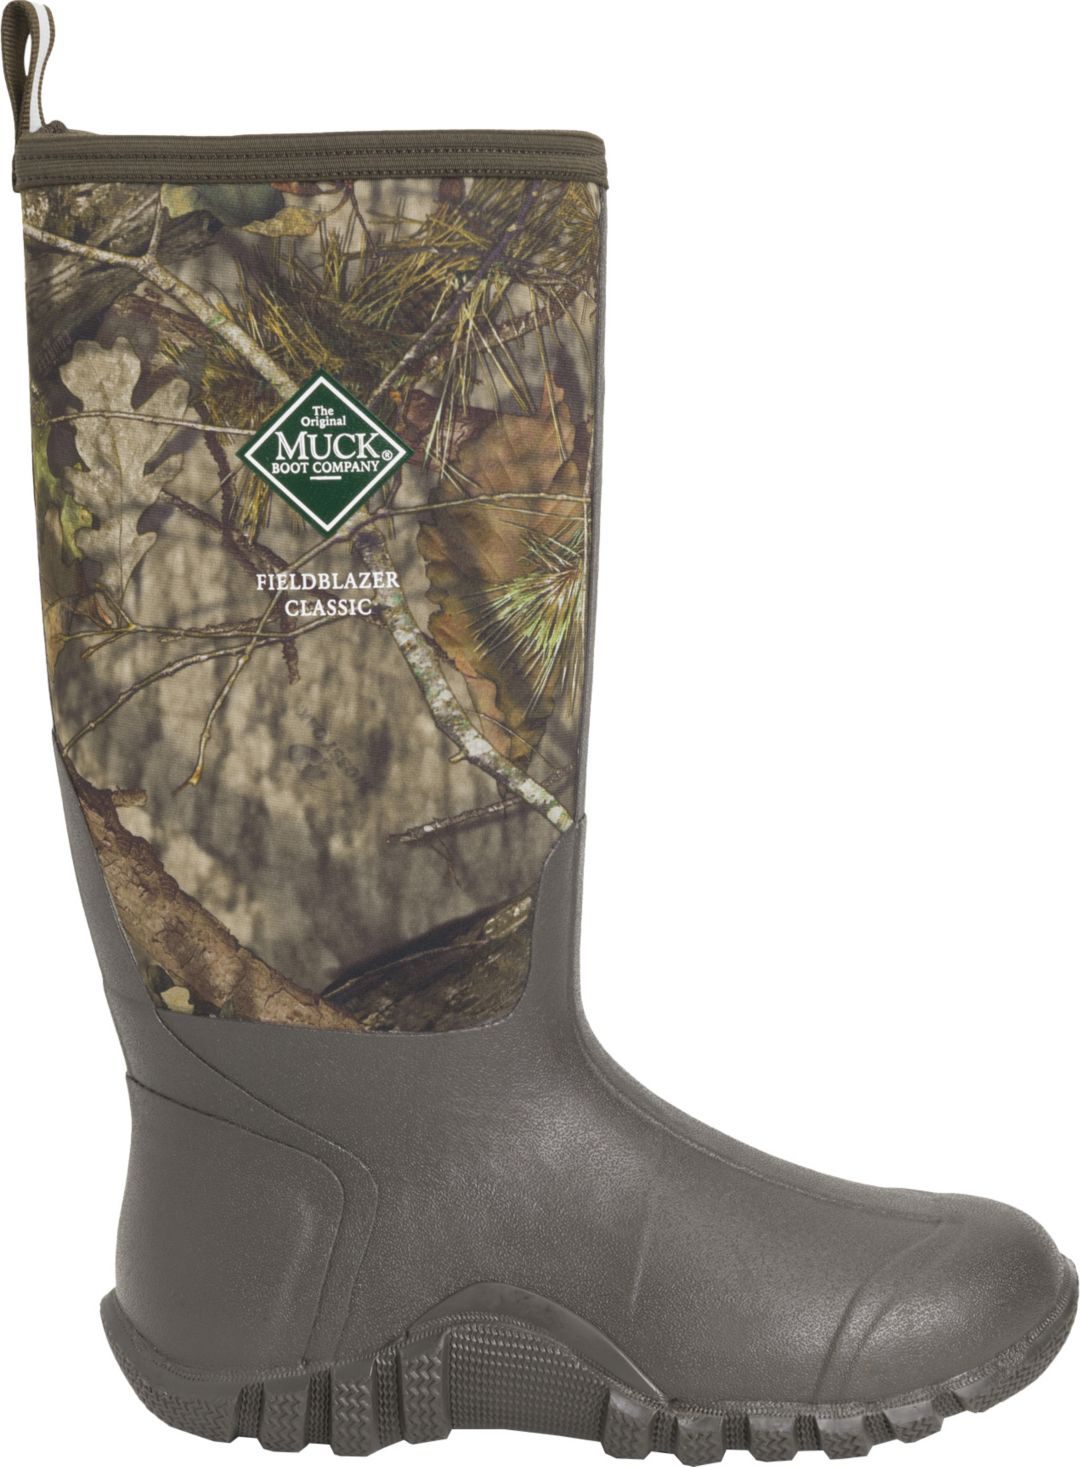 Camo Muck Boots Sale